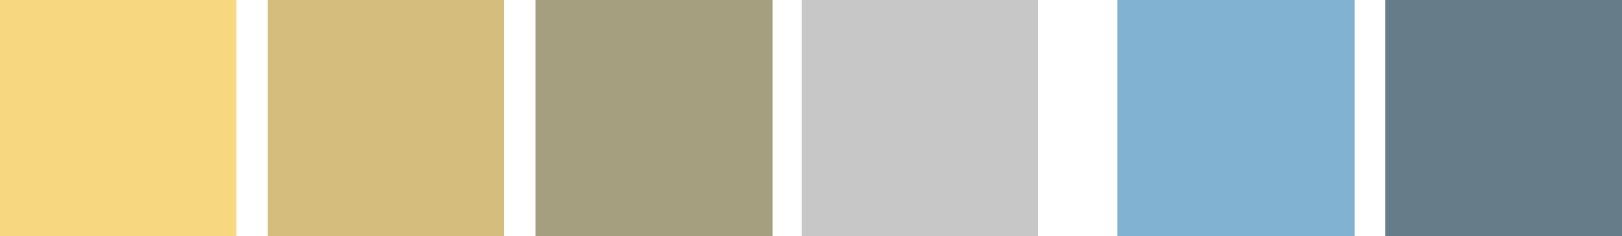 Petite Joie Color SchemeBlau-Beige-Grau